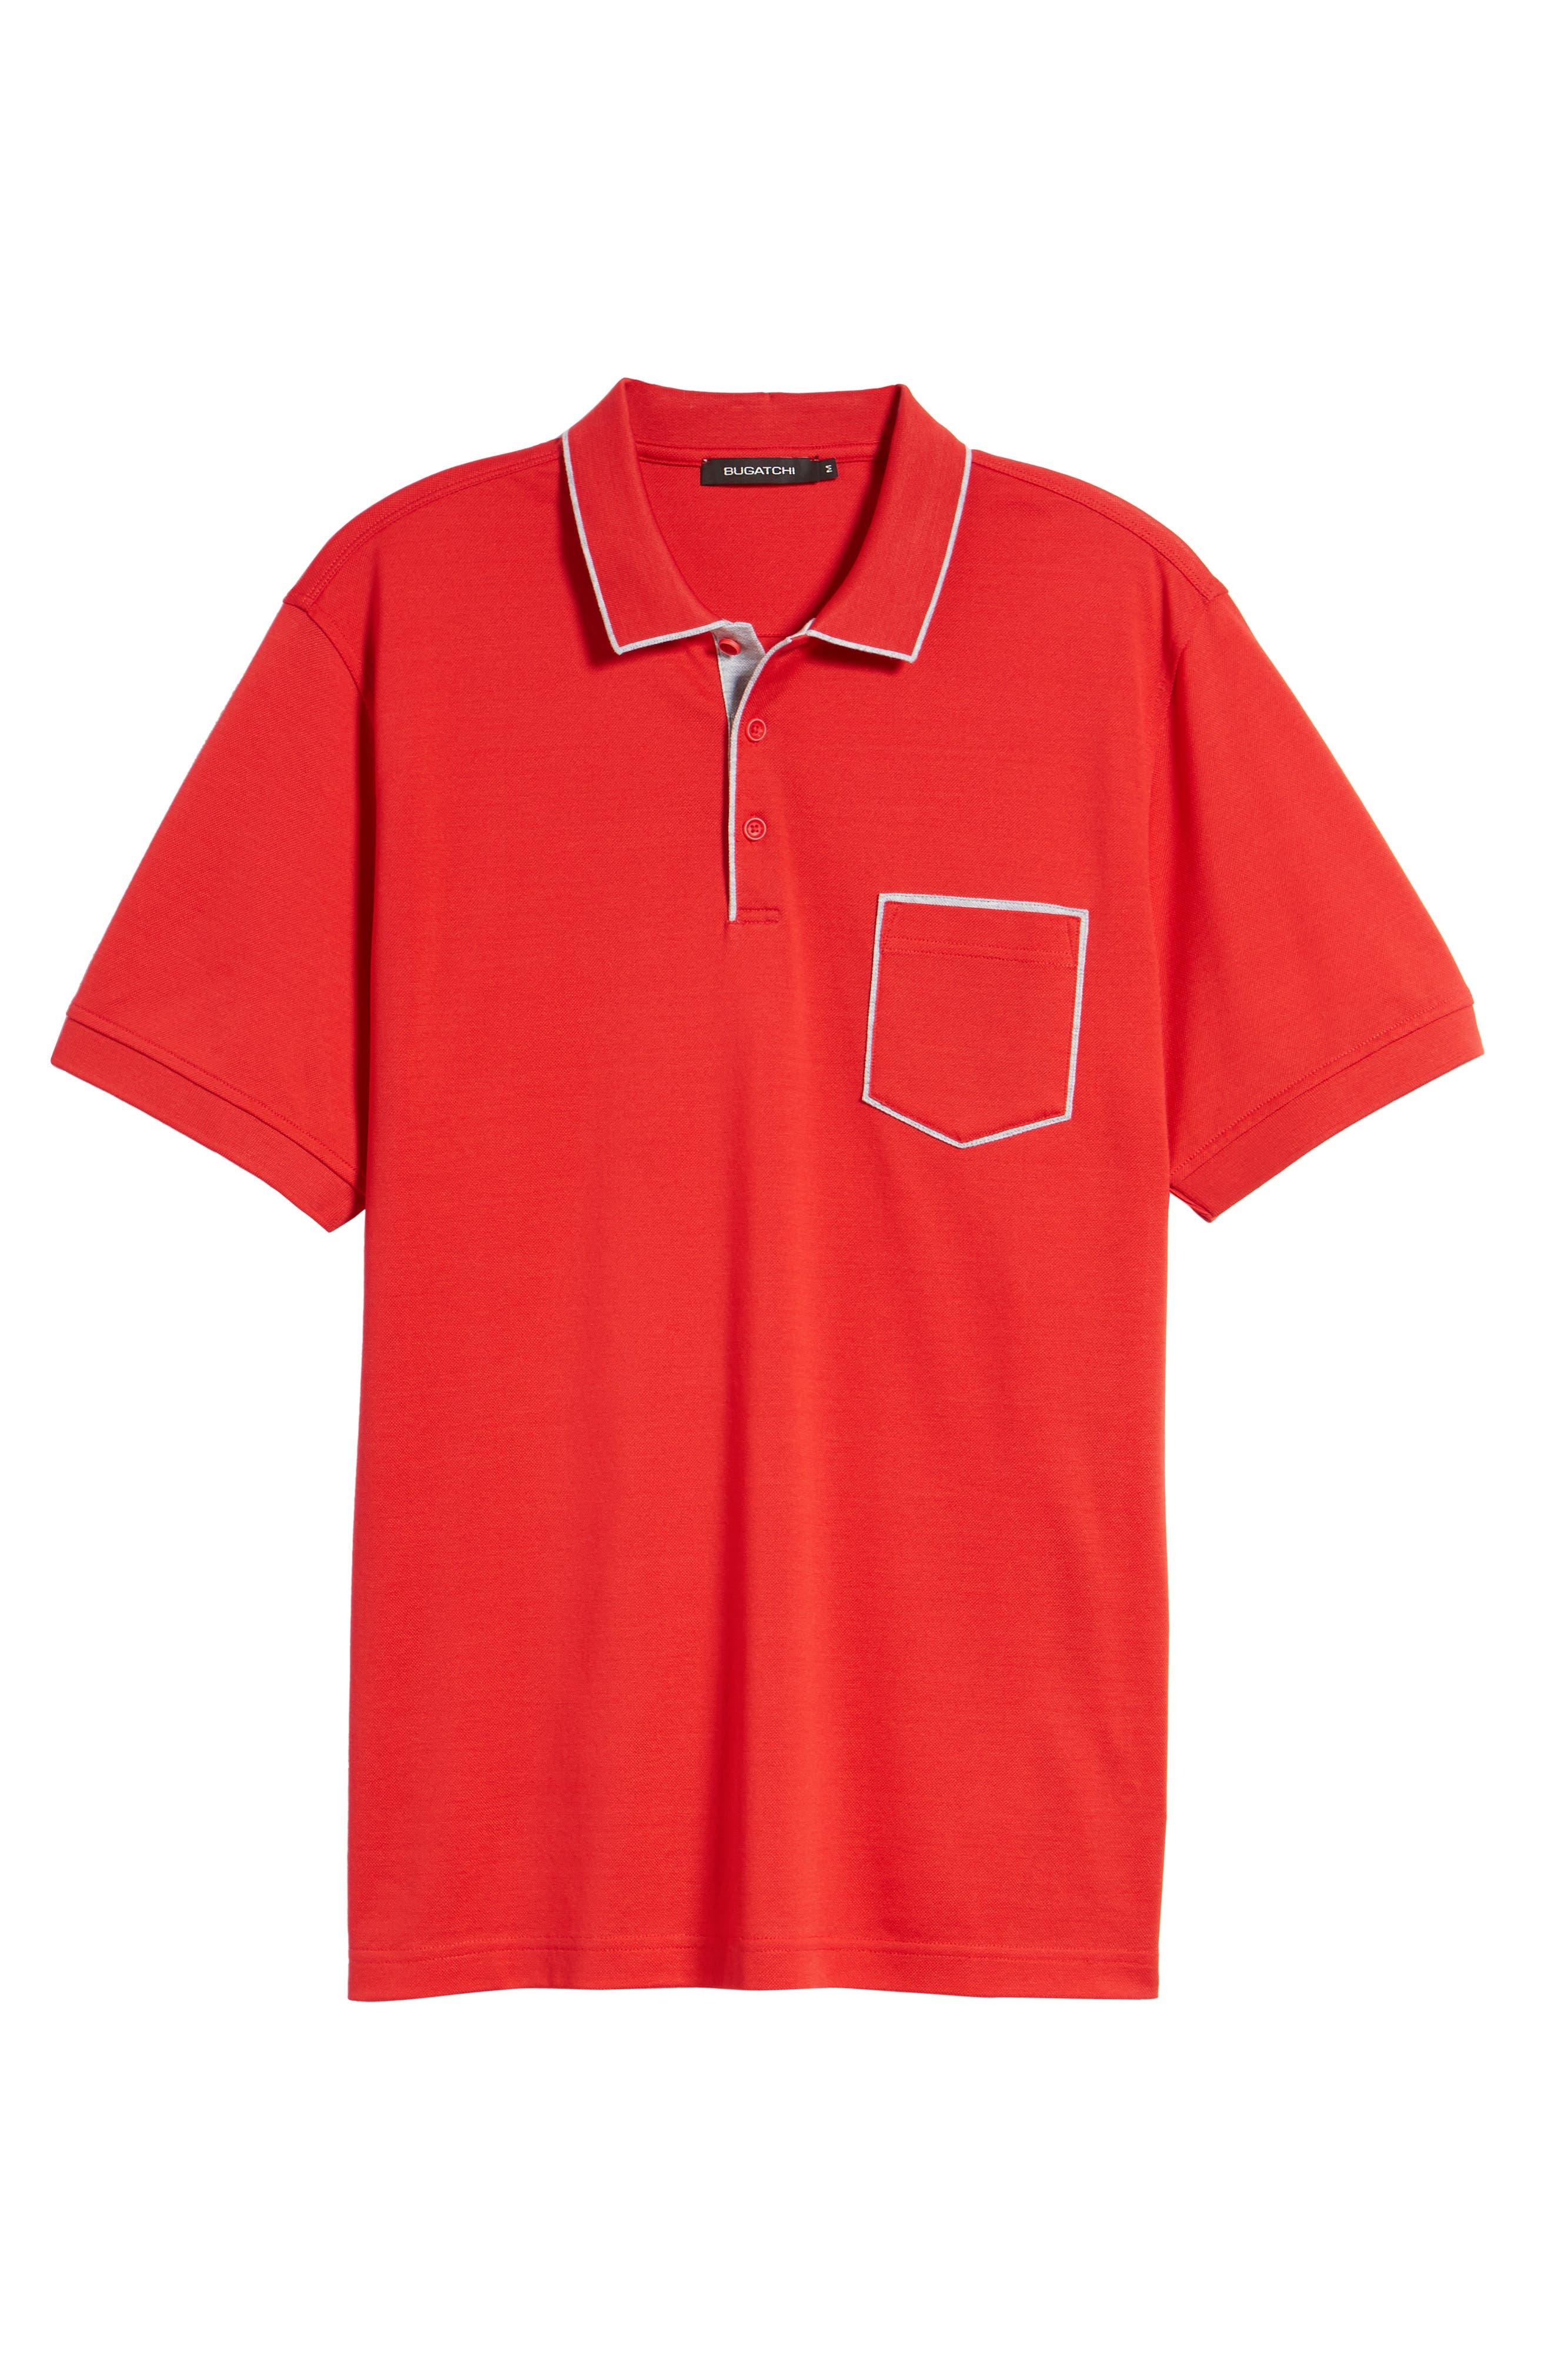 Piqué Knit Polo,                             Alternate thumbnail 6, color,                             Red